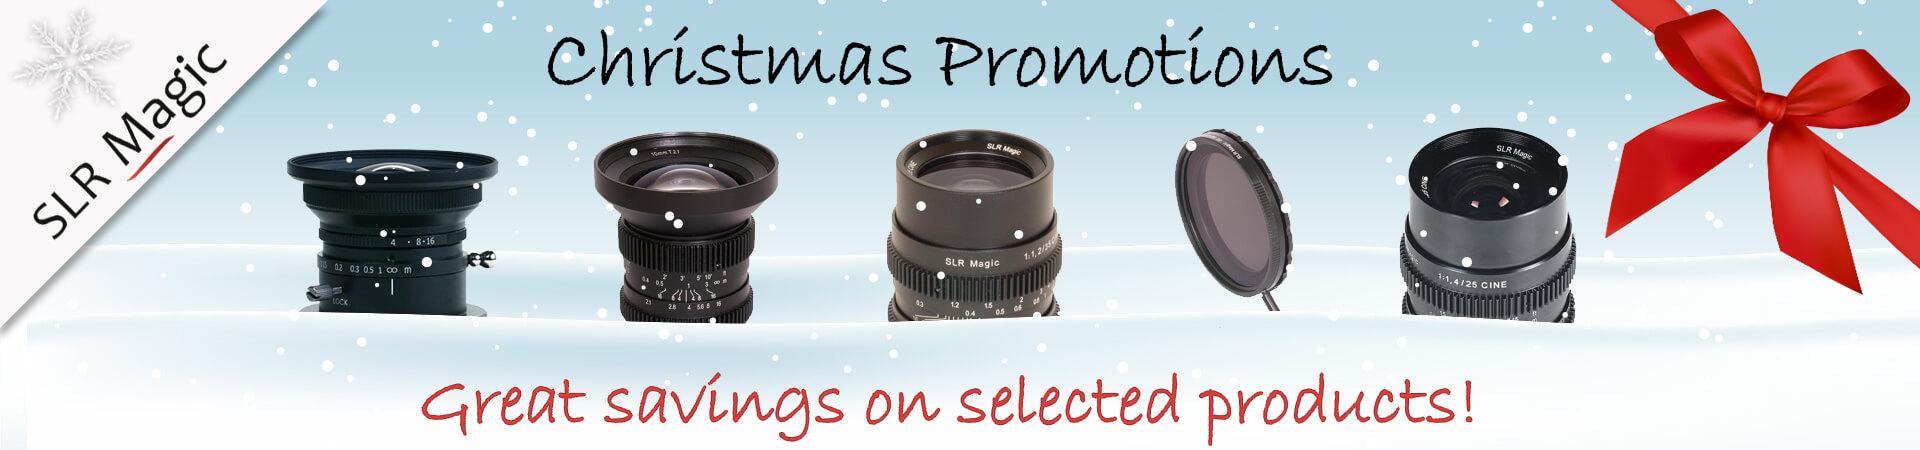 SLR Magic Christmas Promotion